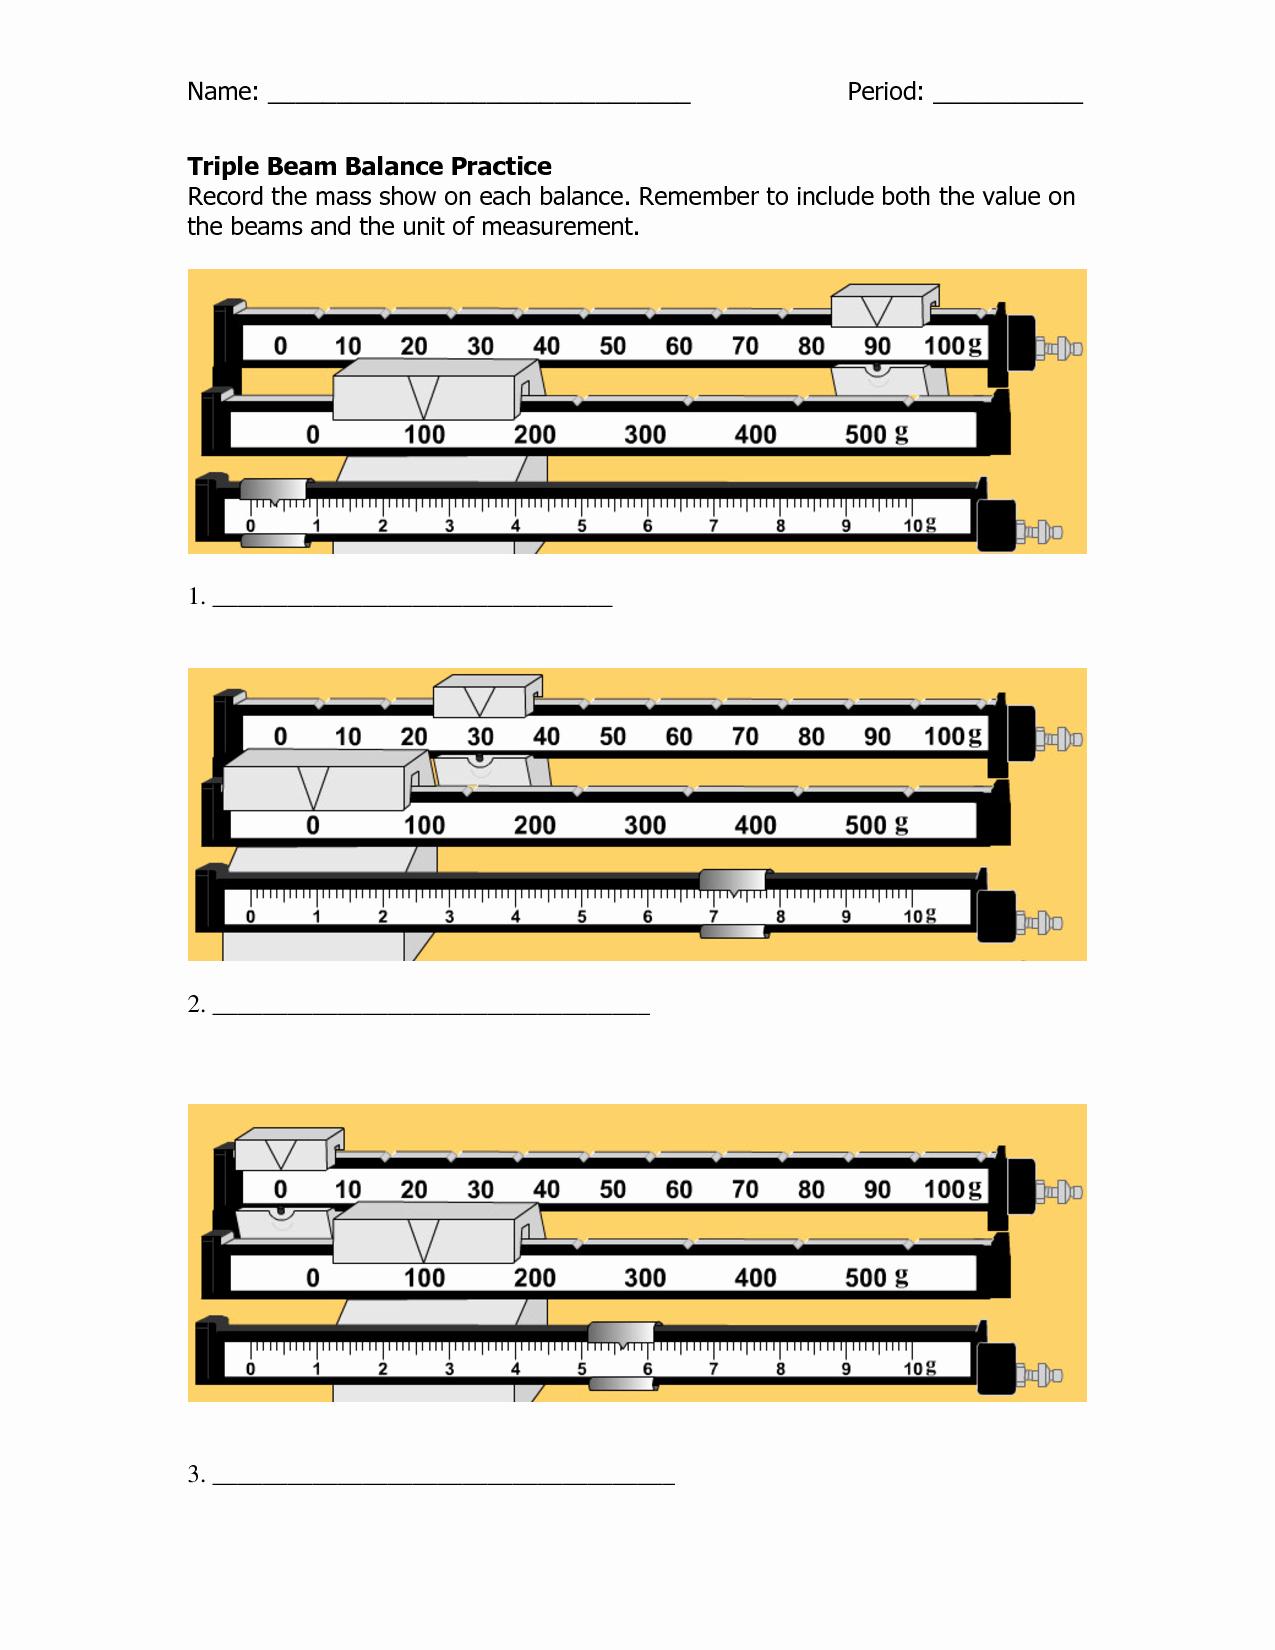 50 Triple Beam Balance Practice Worksheet